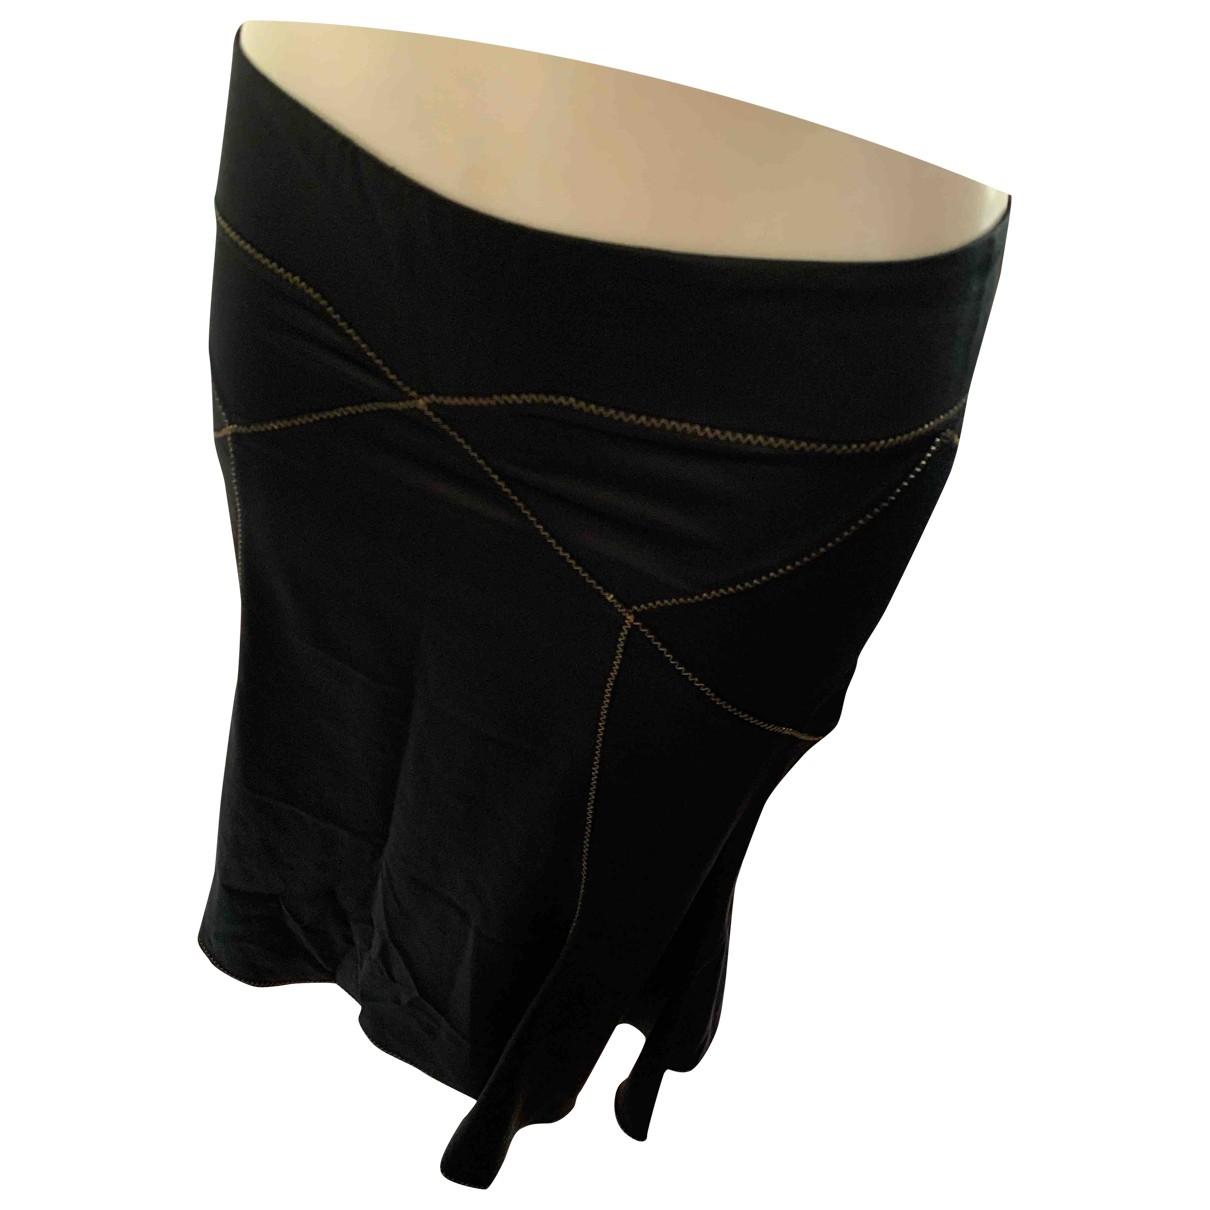 Just Cavalli \N Black Cotton - elasthane skirt for Women 40 IT